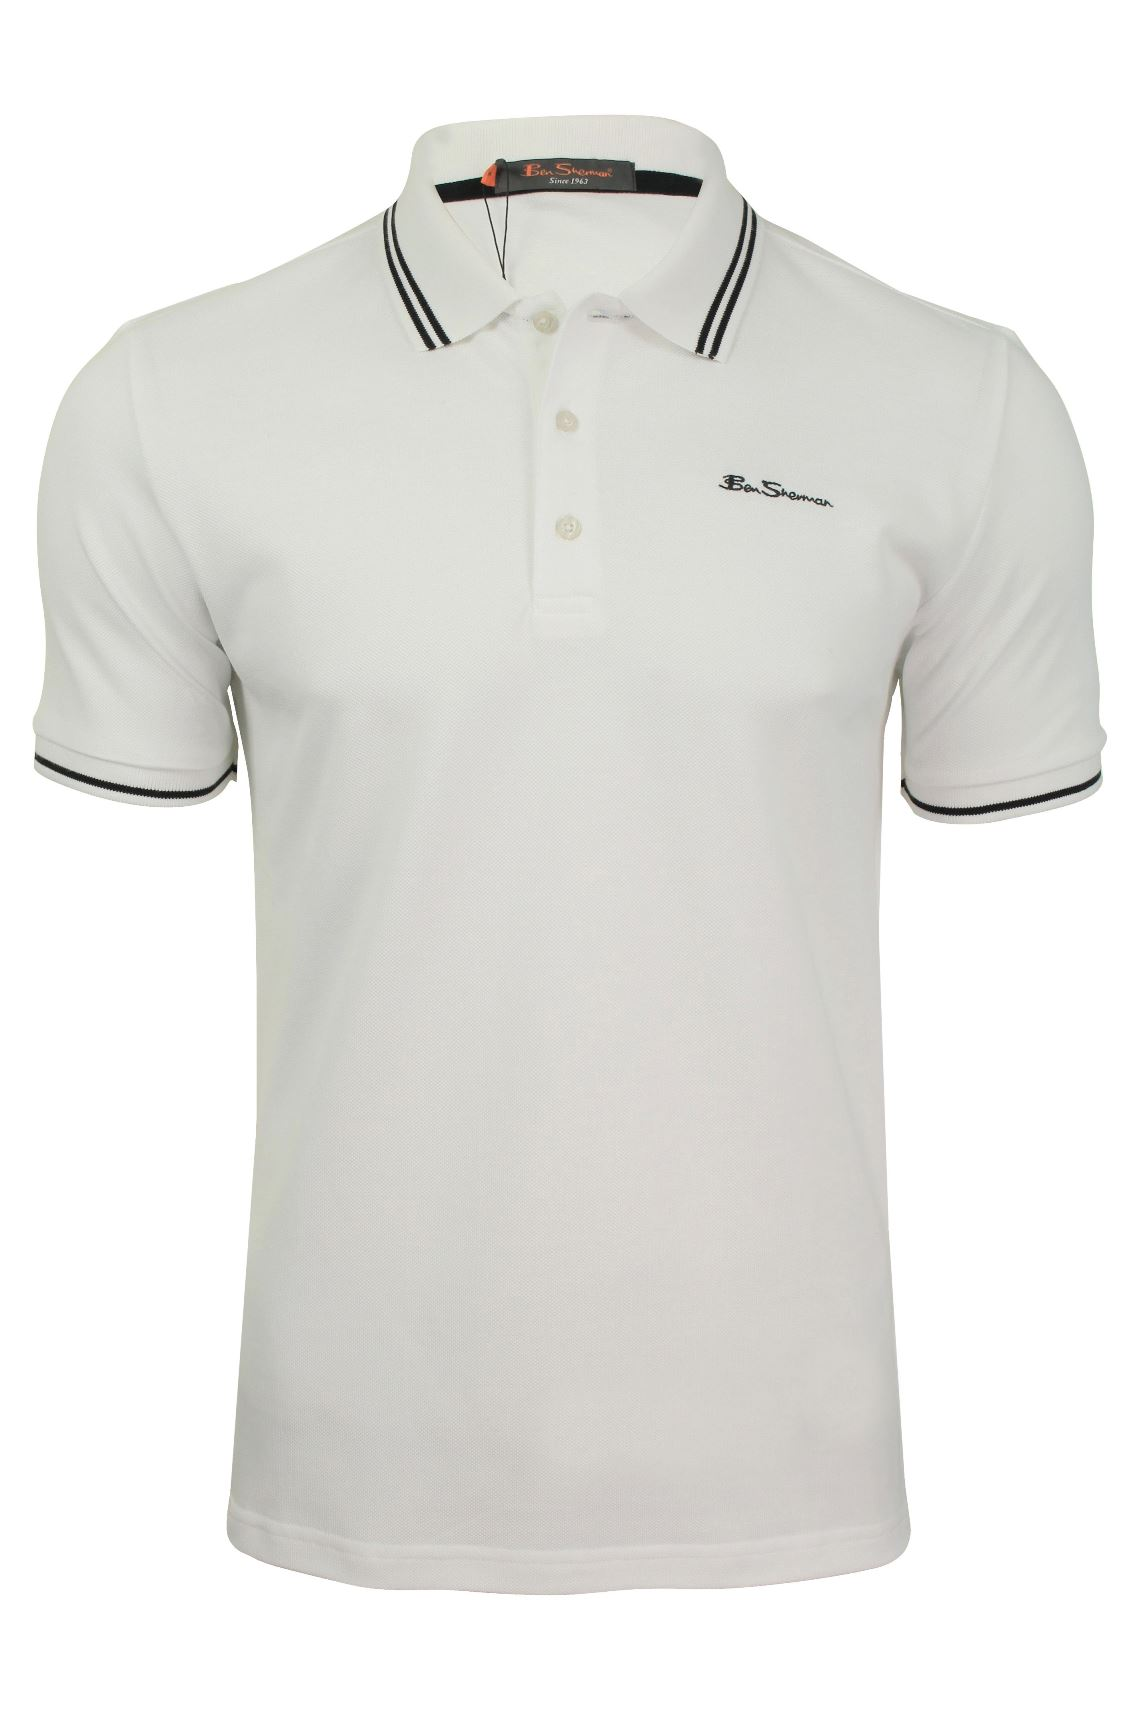 33400100 Mens Tipped Pique Polo Shirt by Ben Sherman | eBay